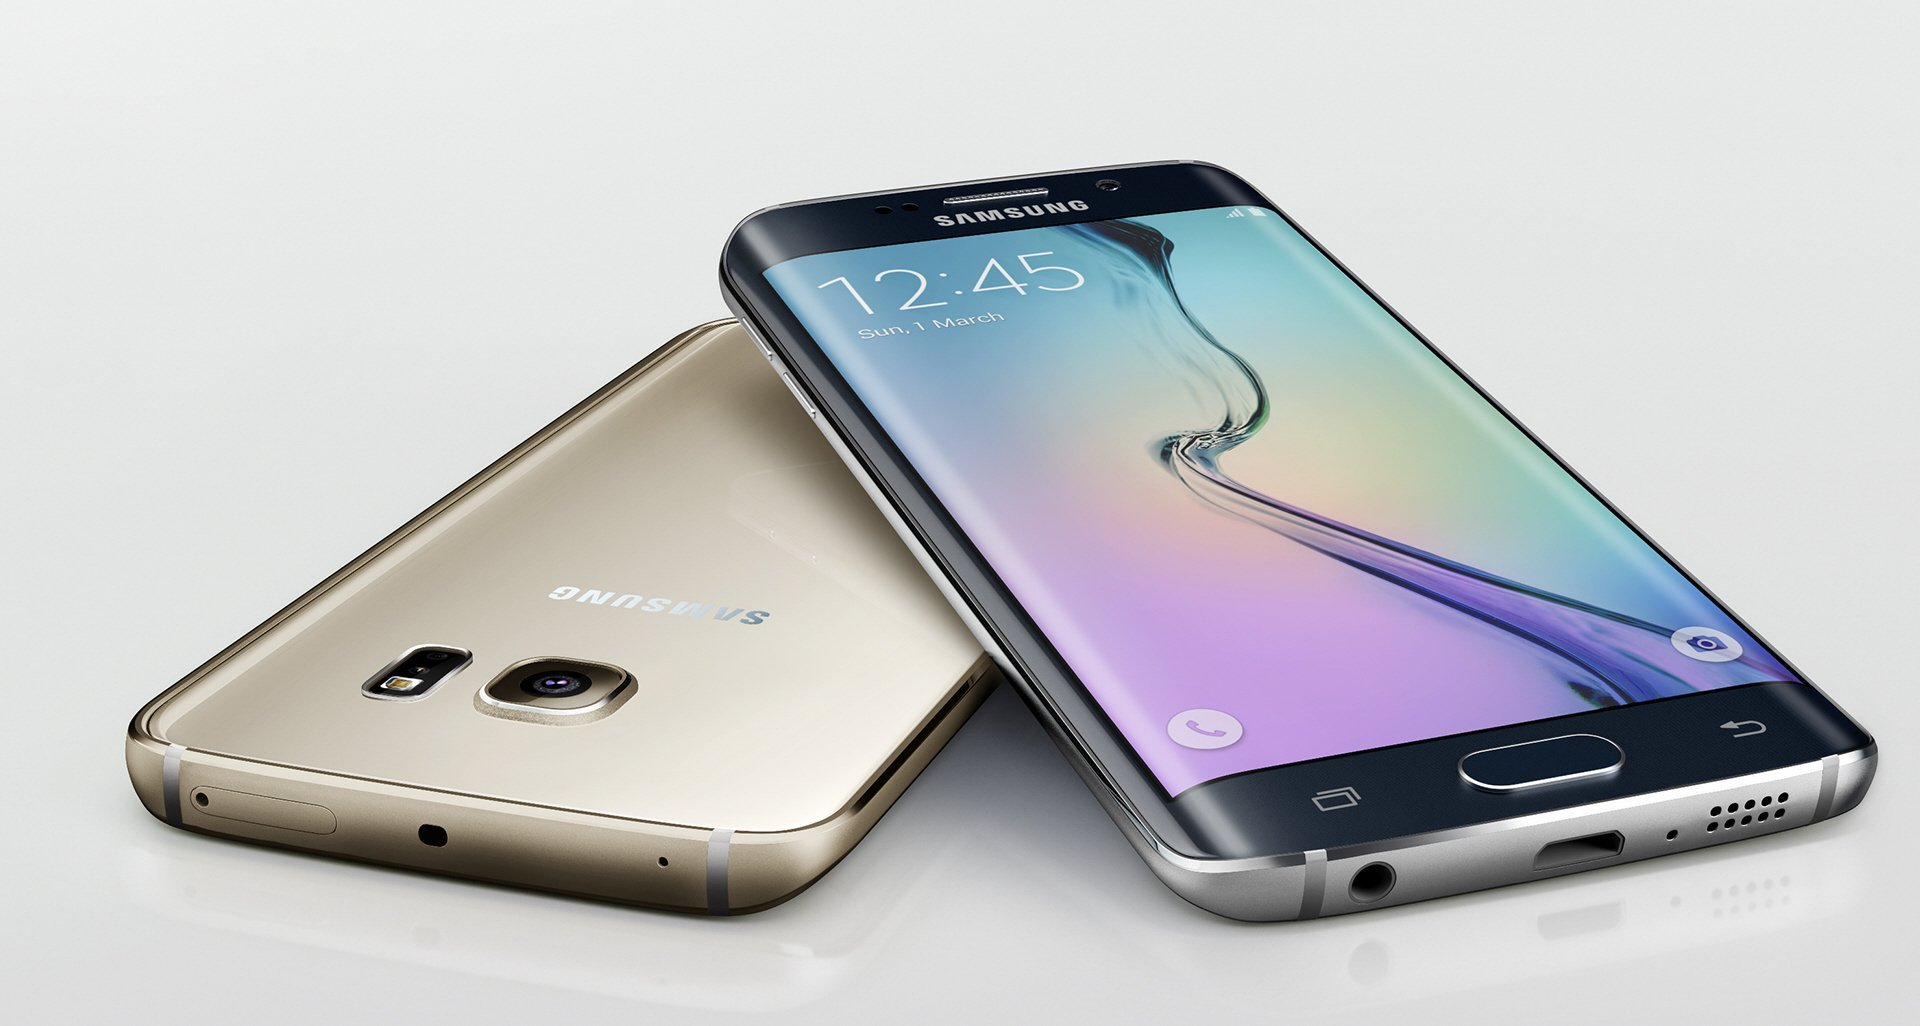 Bon plan : Le Samsung Galaxy S6 Edge à 599,95 euros avec jusqu'à 120 euros en bons d'achat